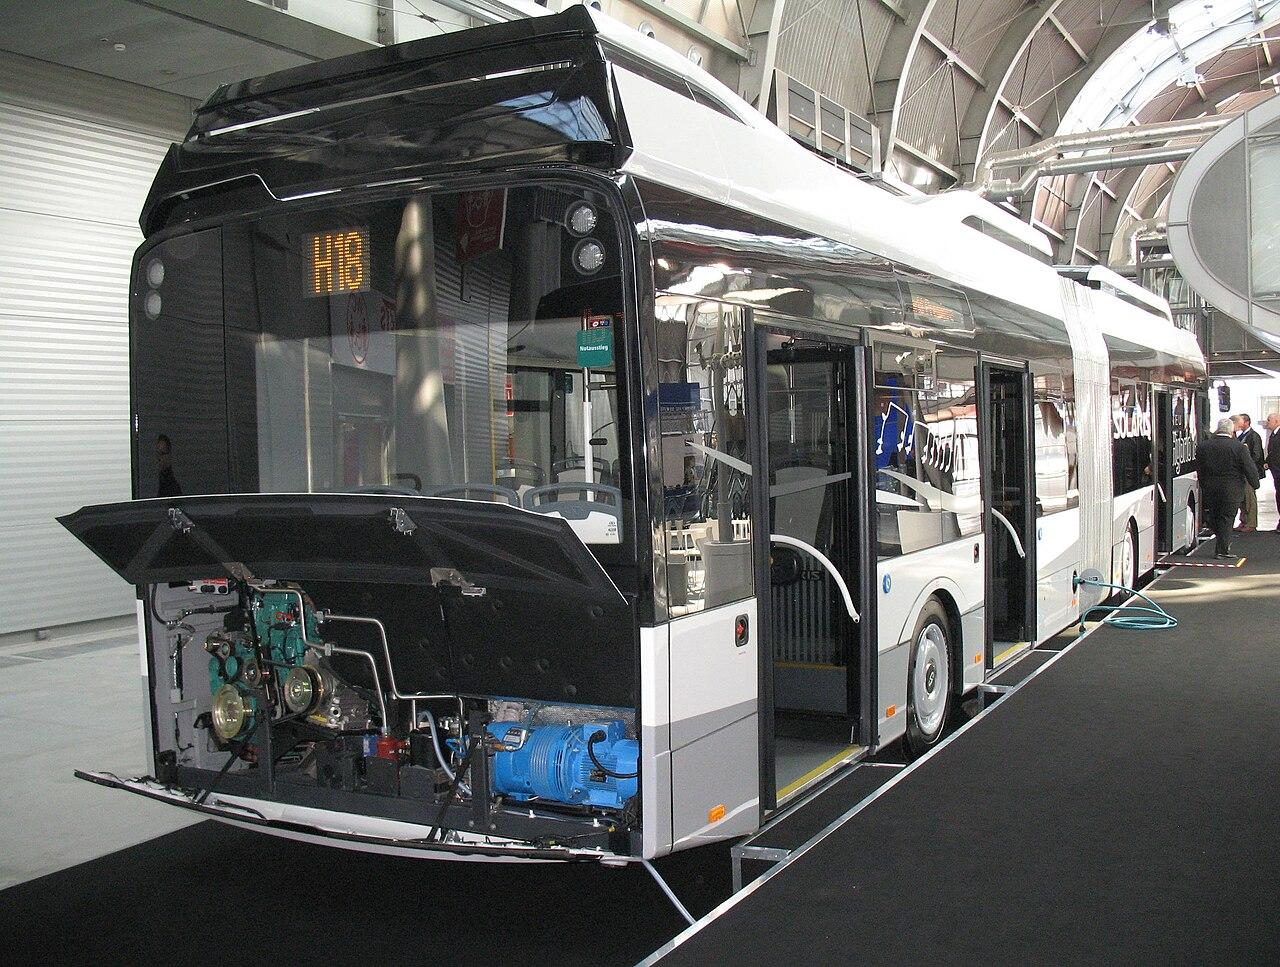 VK Sondermodell 1063 Solaris Urbino 18 Hybrid Bogestra Nr 4 Wg